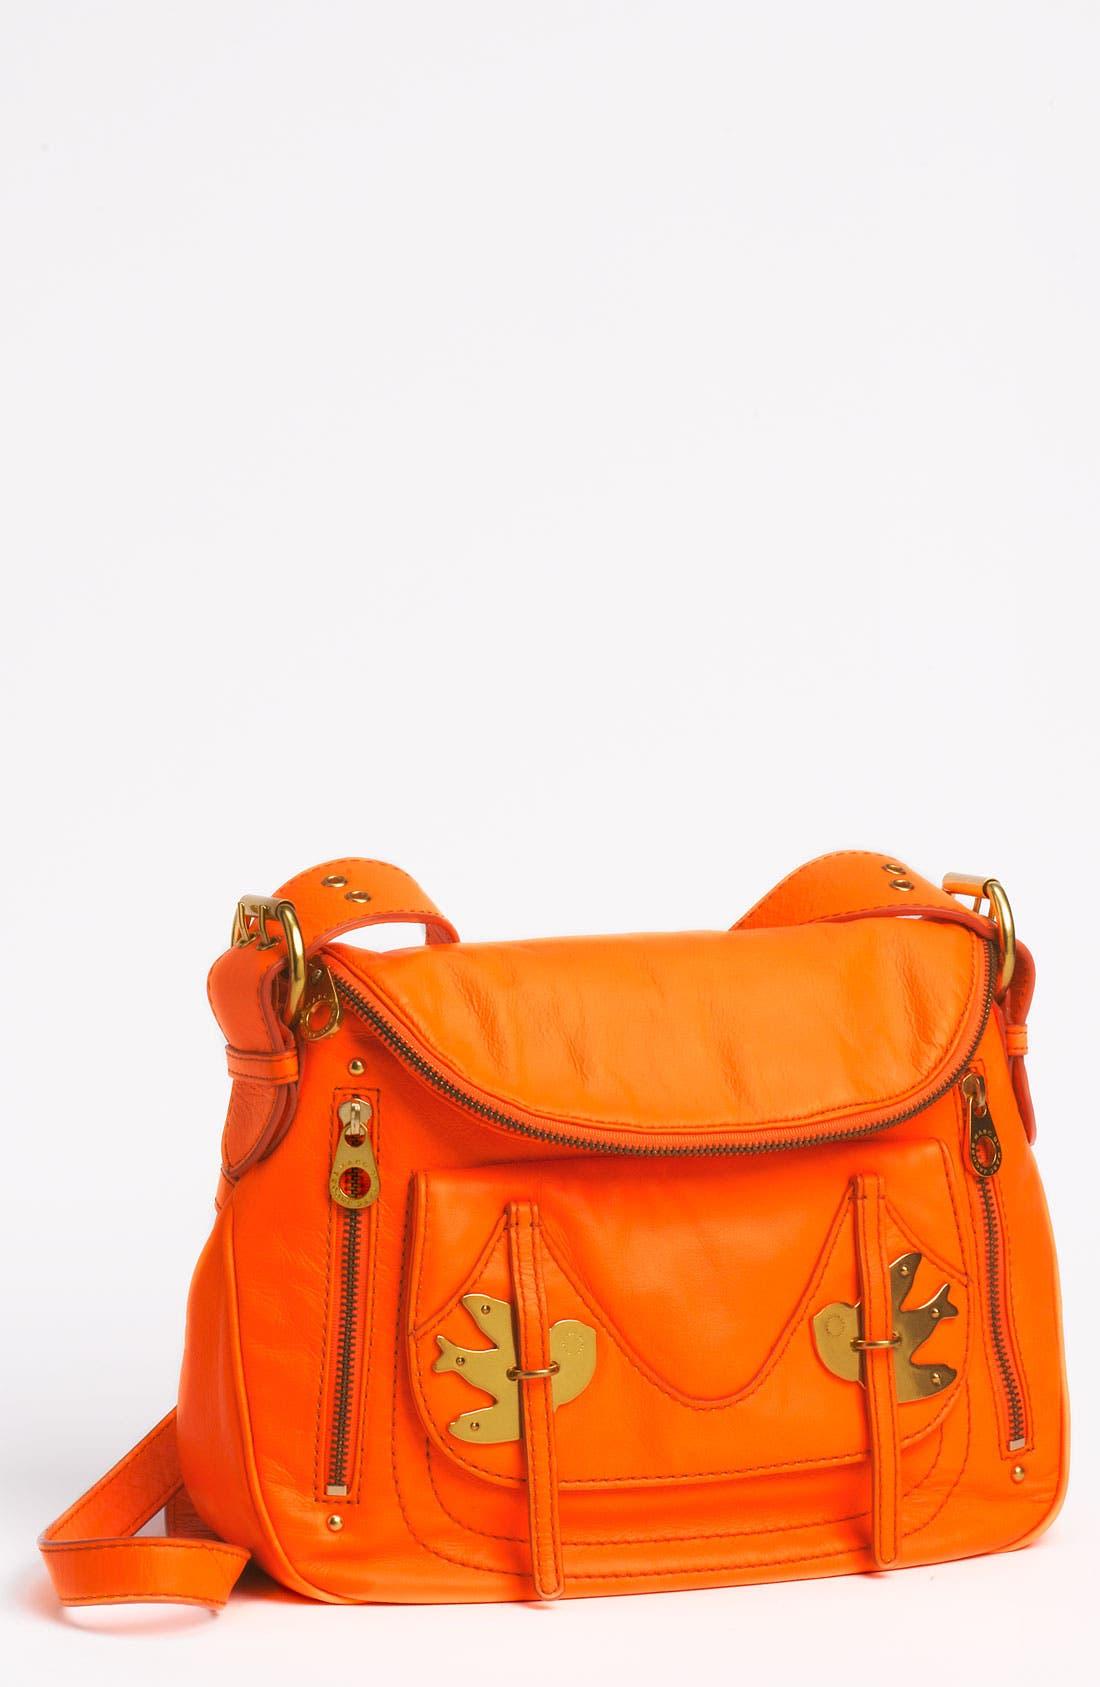 ,                             MARC BY MARC JACOBS 'Petal to the Metal - Natasha' Flap Crossbody Bag, Medium,                             Main thumbnail 46, color,                             823